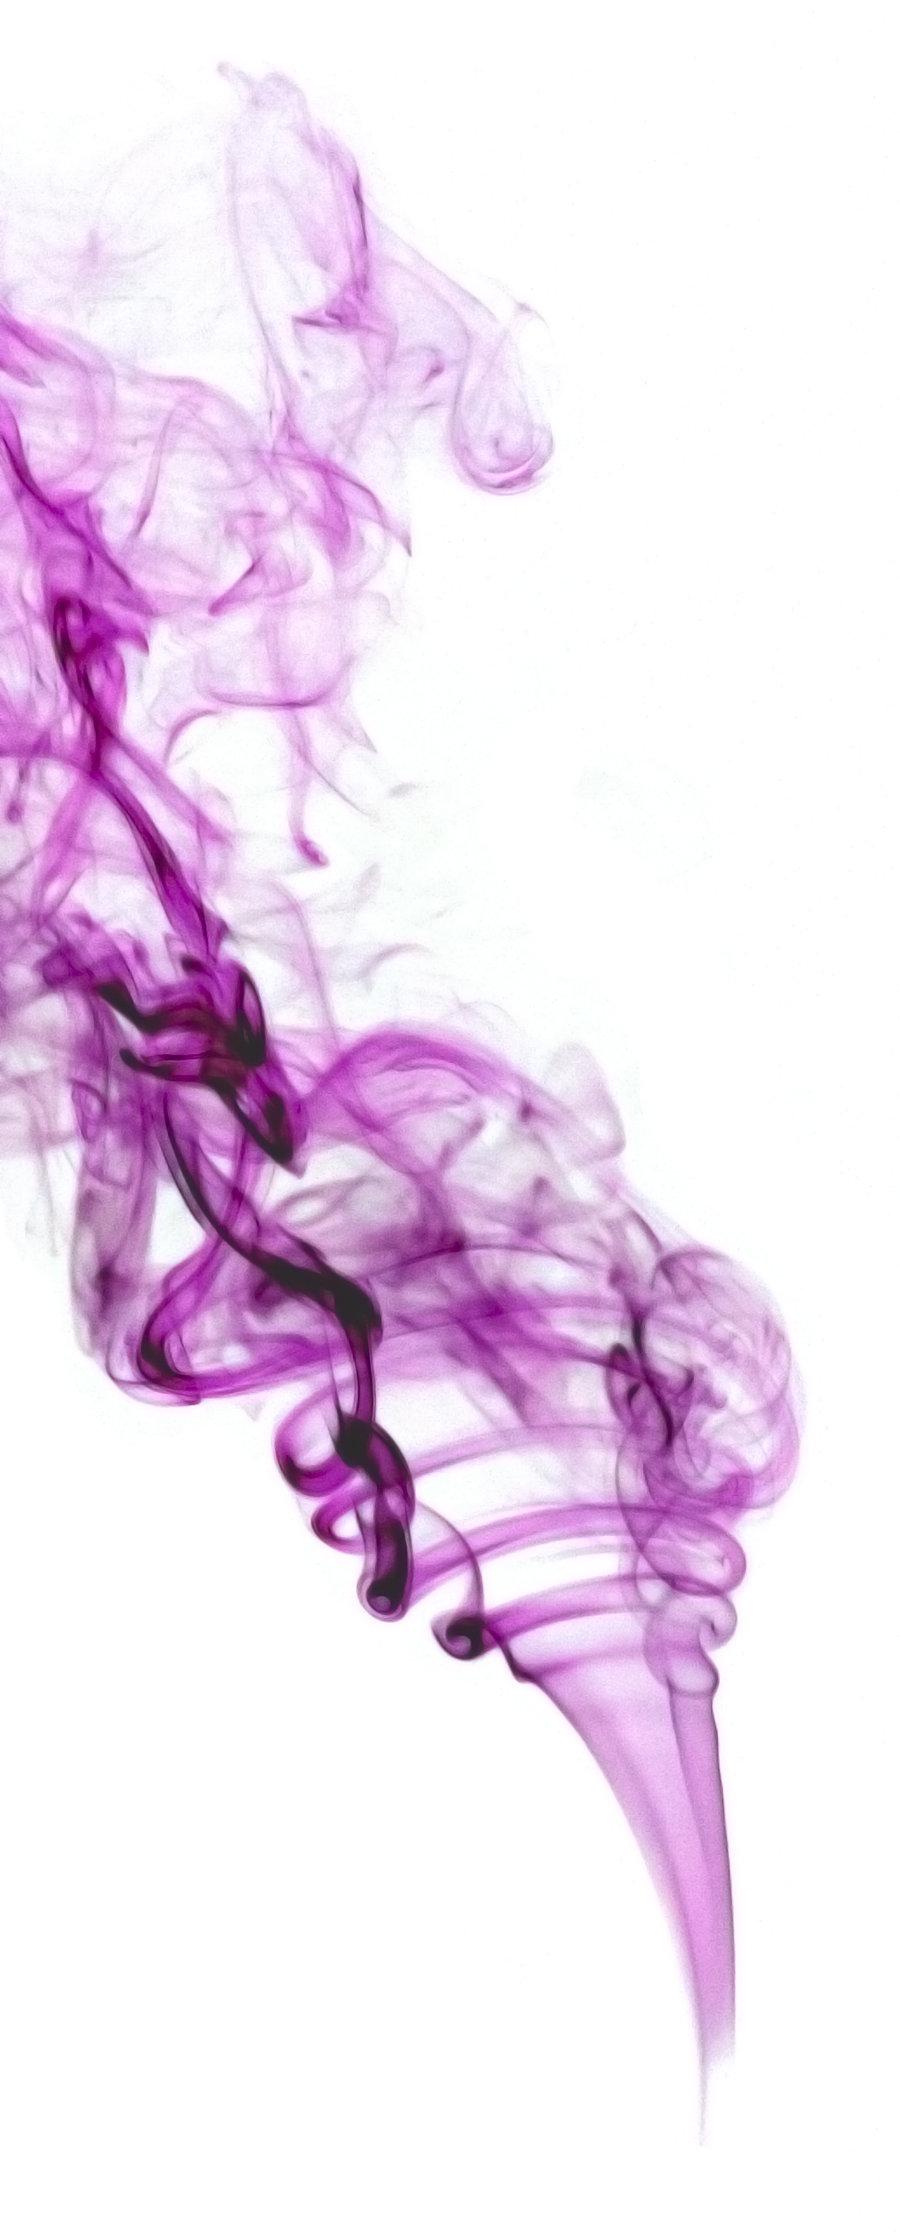 Purple Smoke Negative by Stevoa5 on DeviantArt